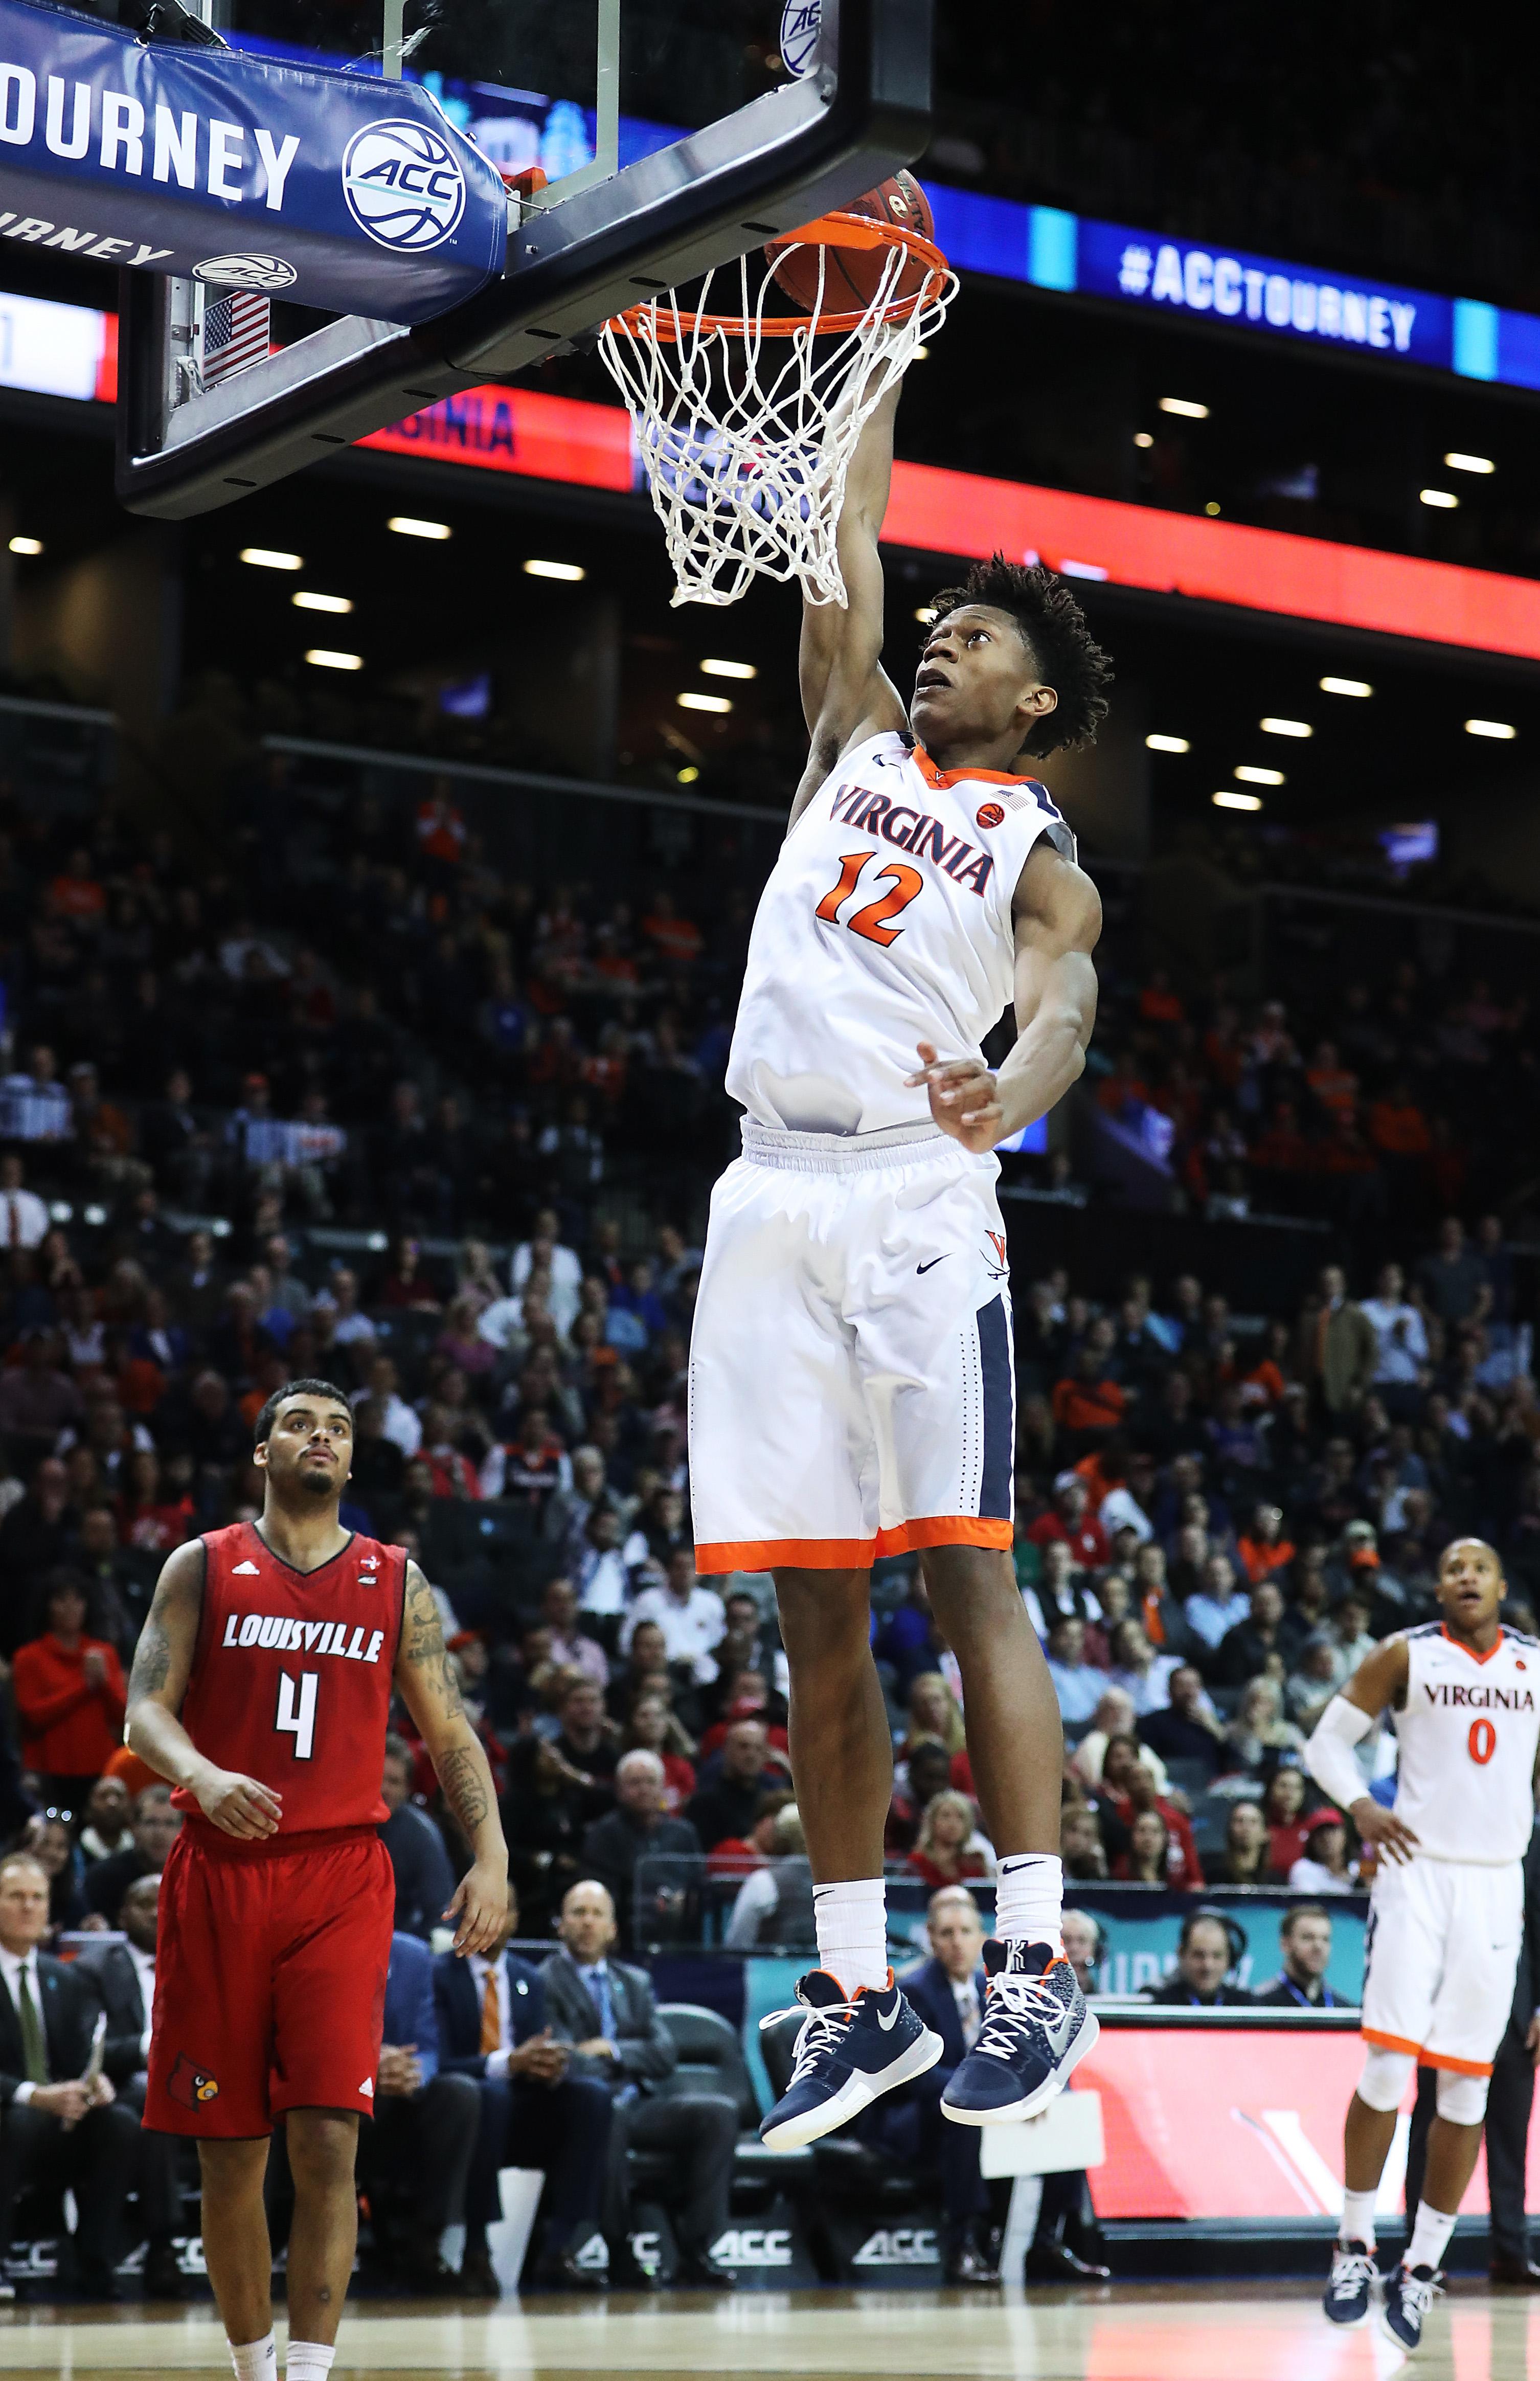 ACC Basketball Tournament - Quarterfinals Va v Louisville